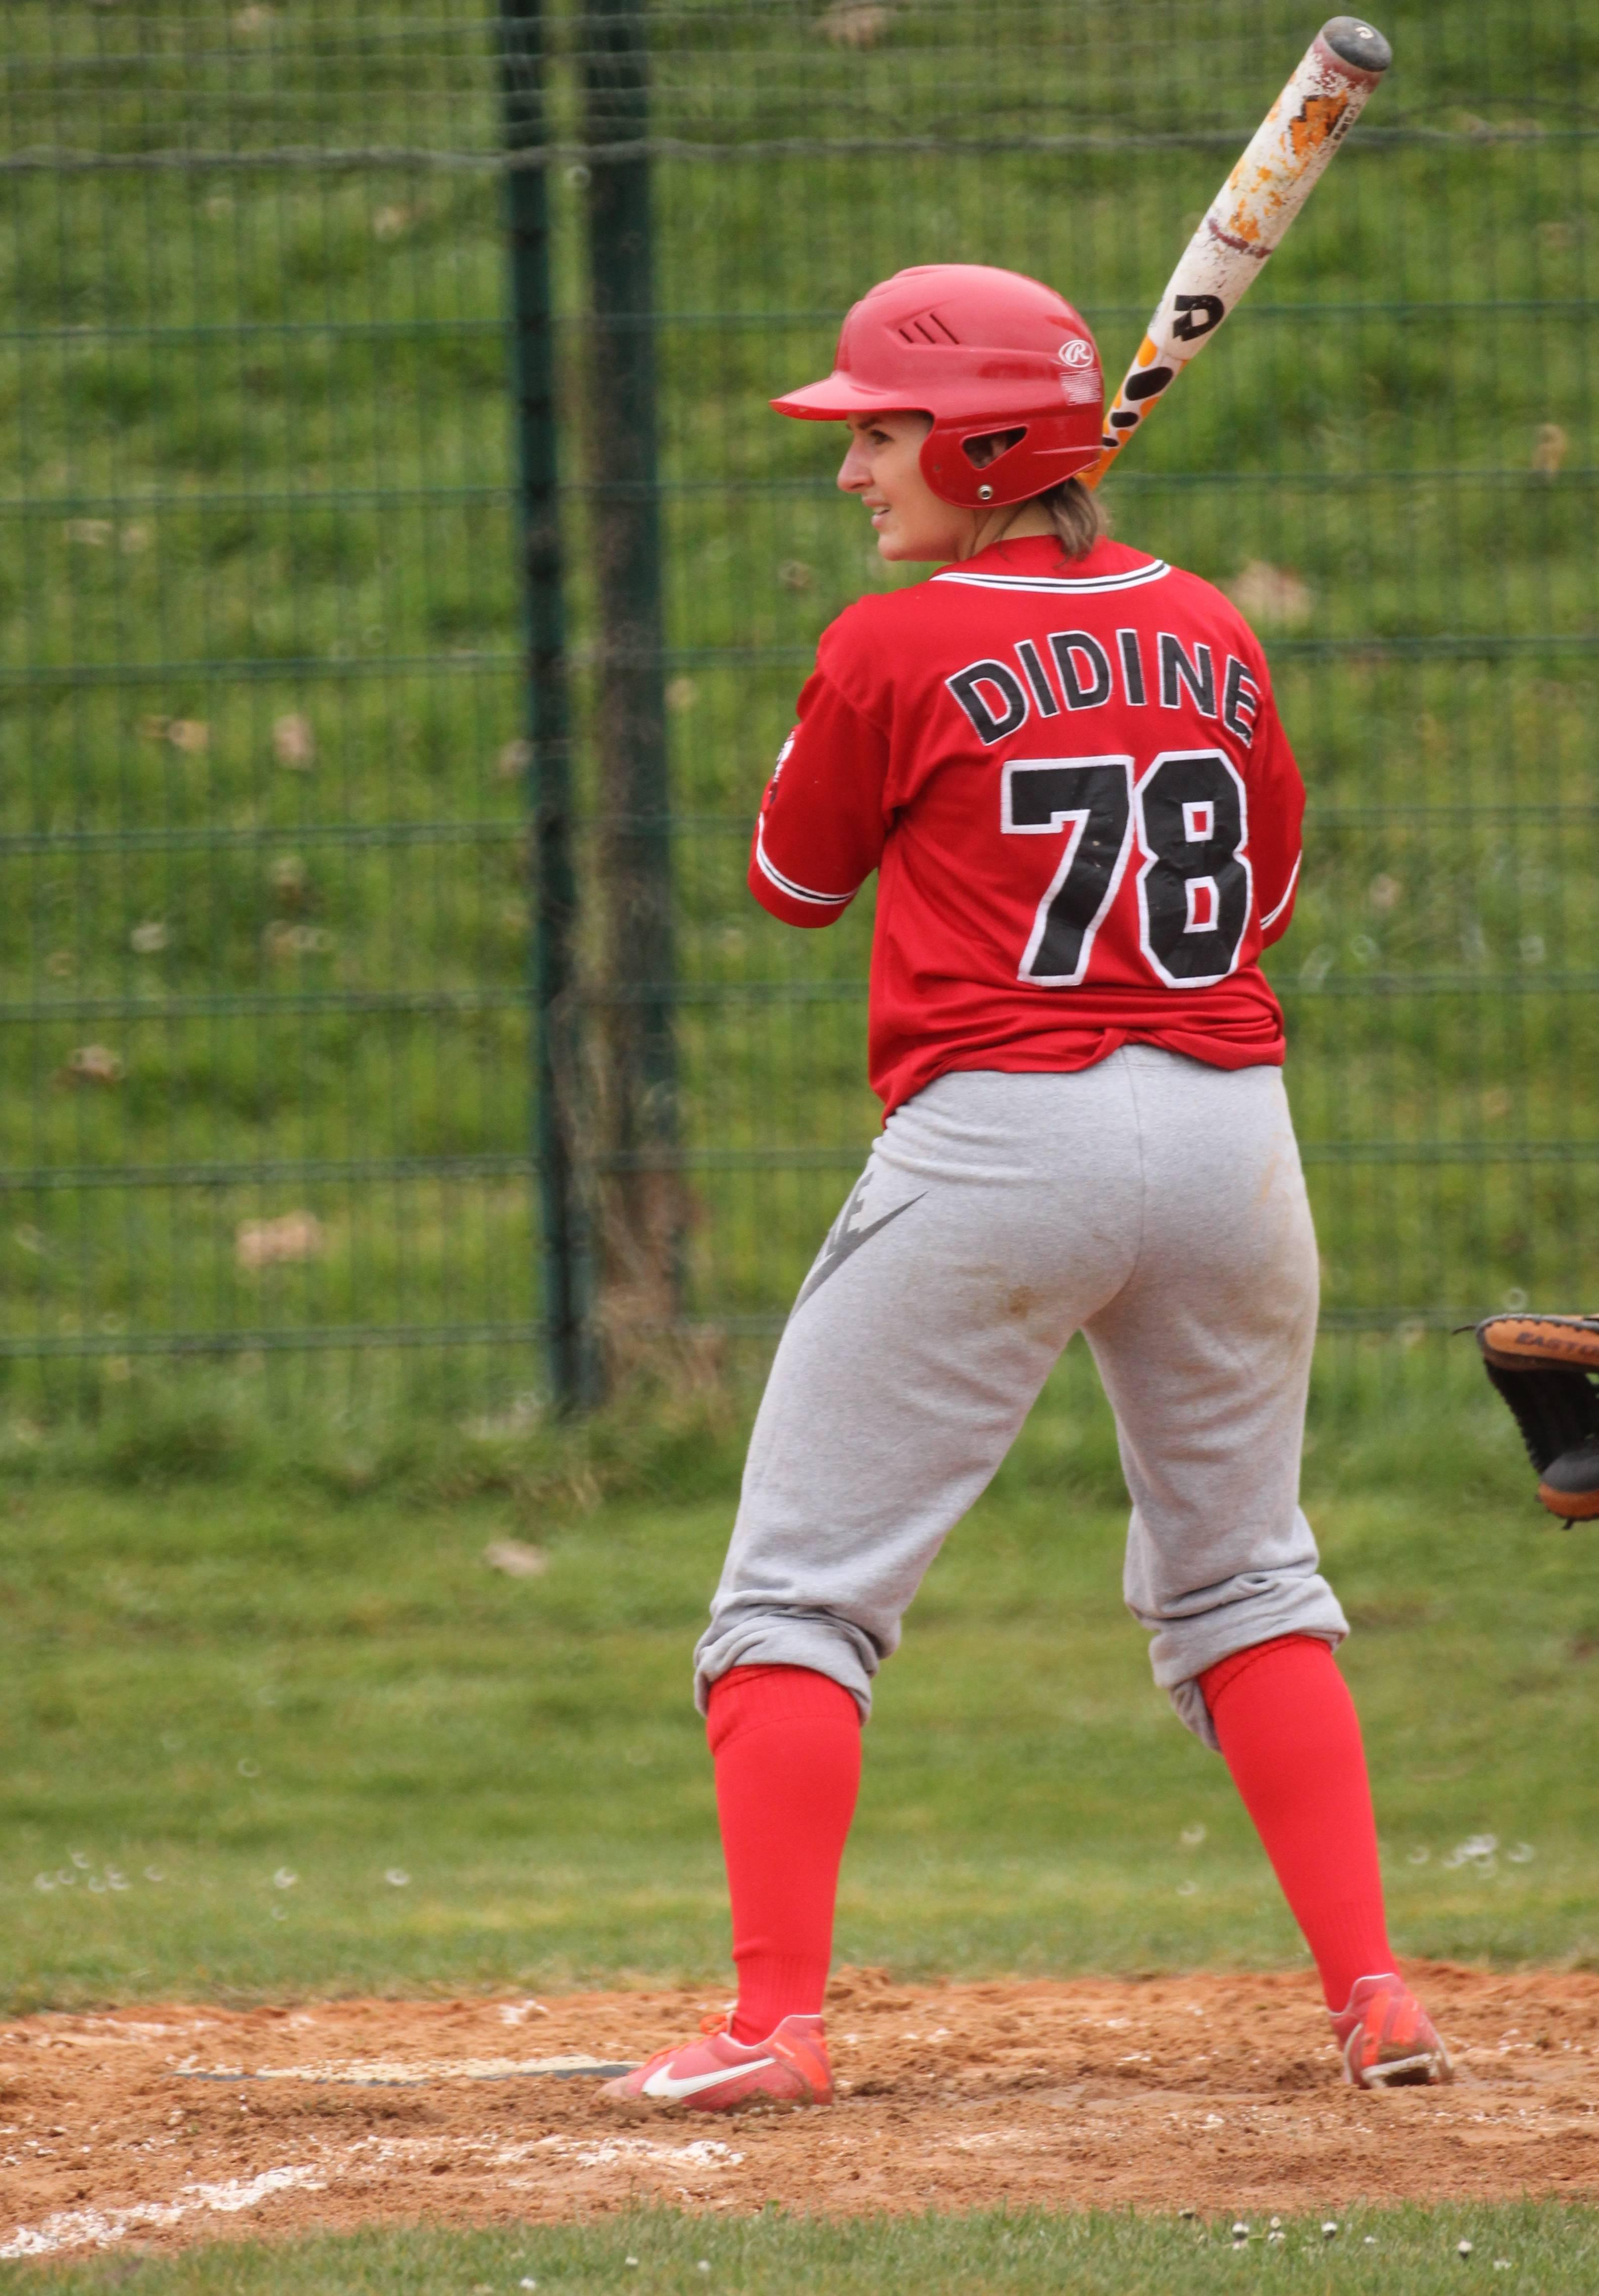 2015-03-28 Baseball R3 (20)